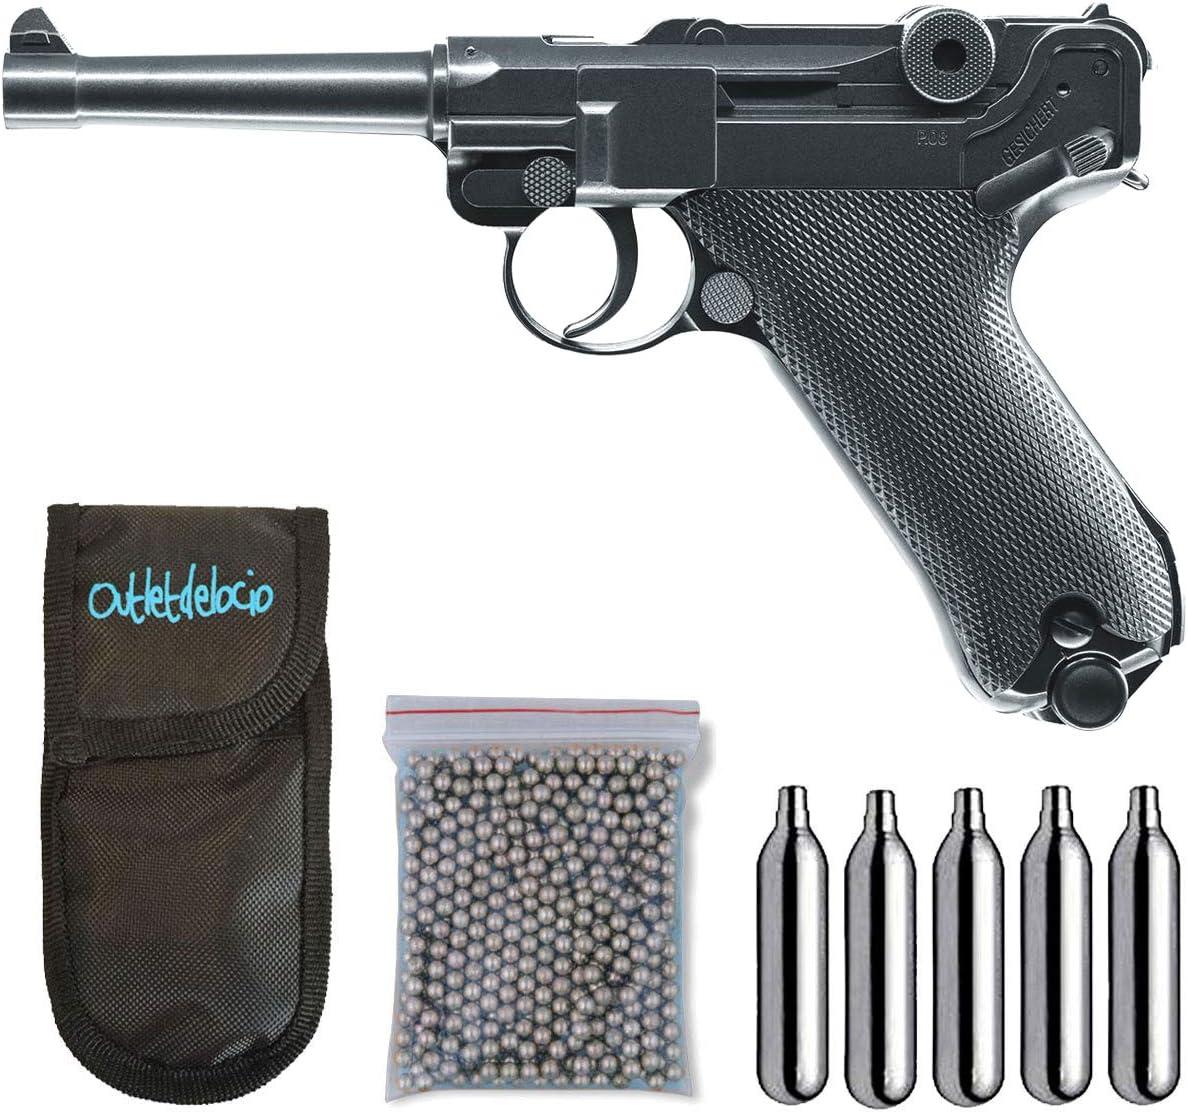 Outletdelocio. Pistola perdigon Luger P08 Full Metal 4,5mm + Funda Portabombonas + Balines + Bombonas co2. 23054/29318/38123